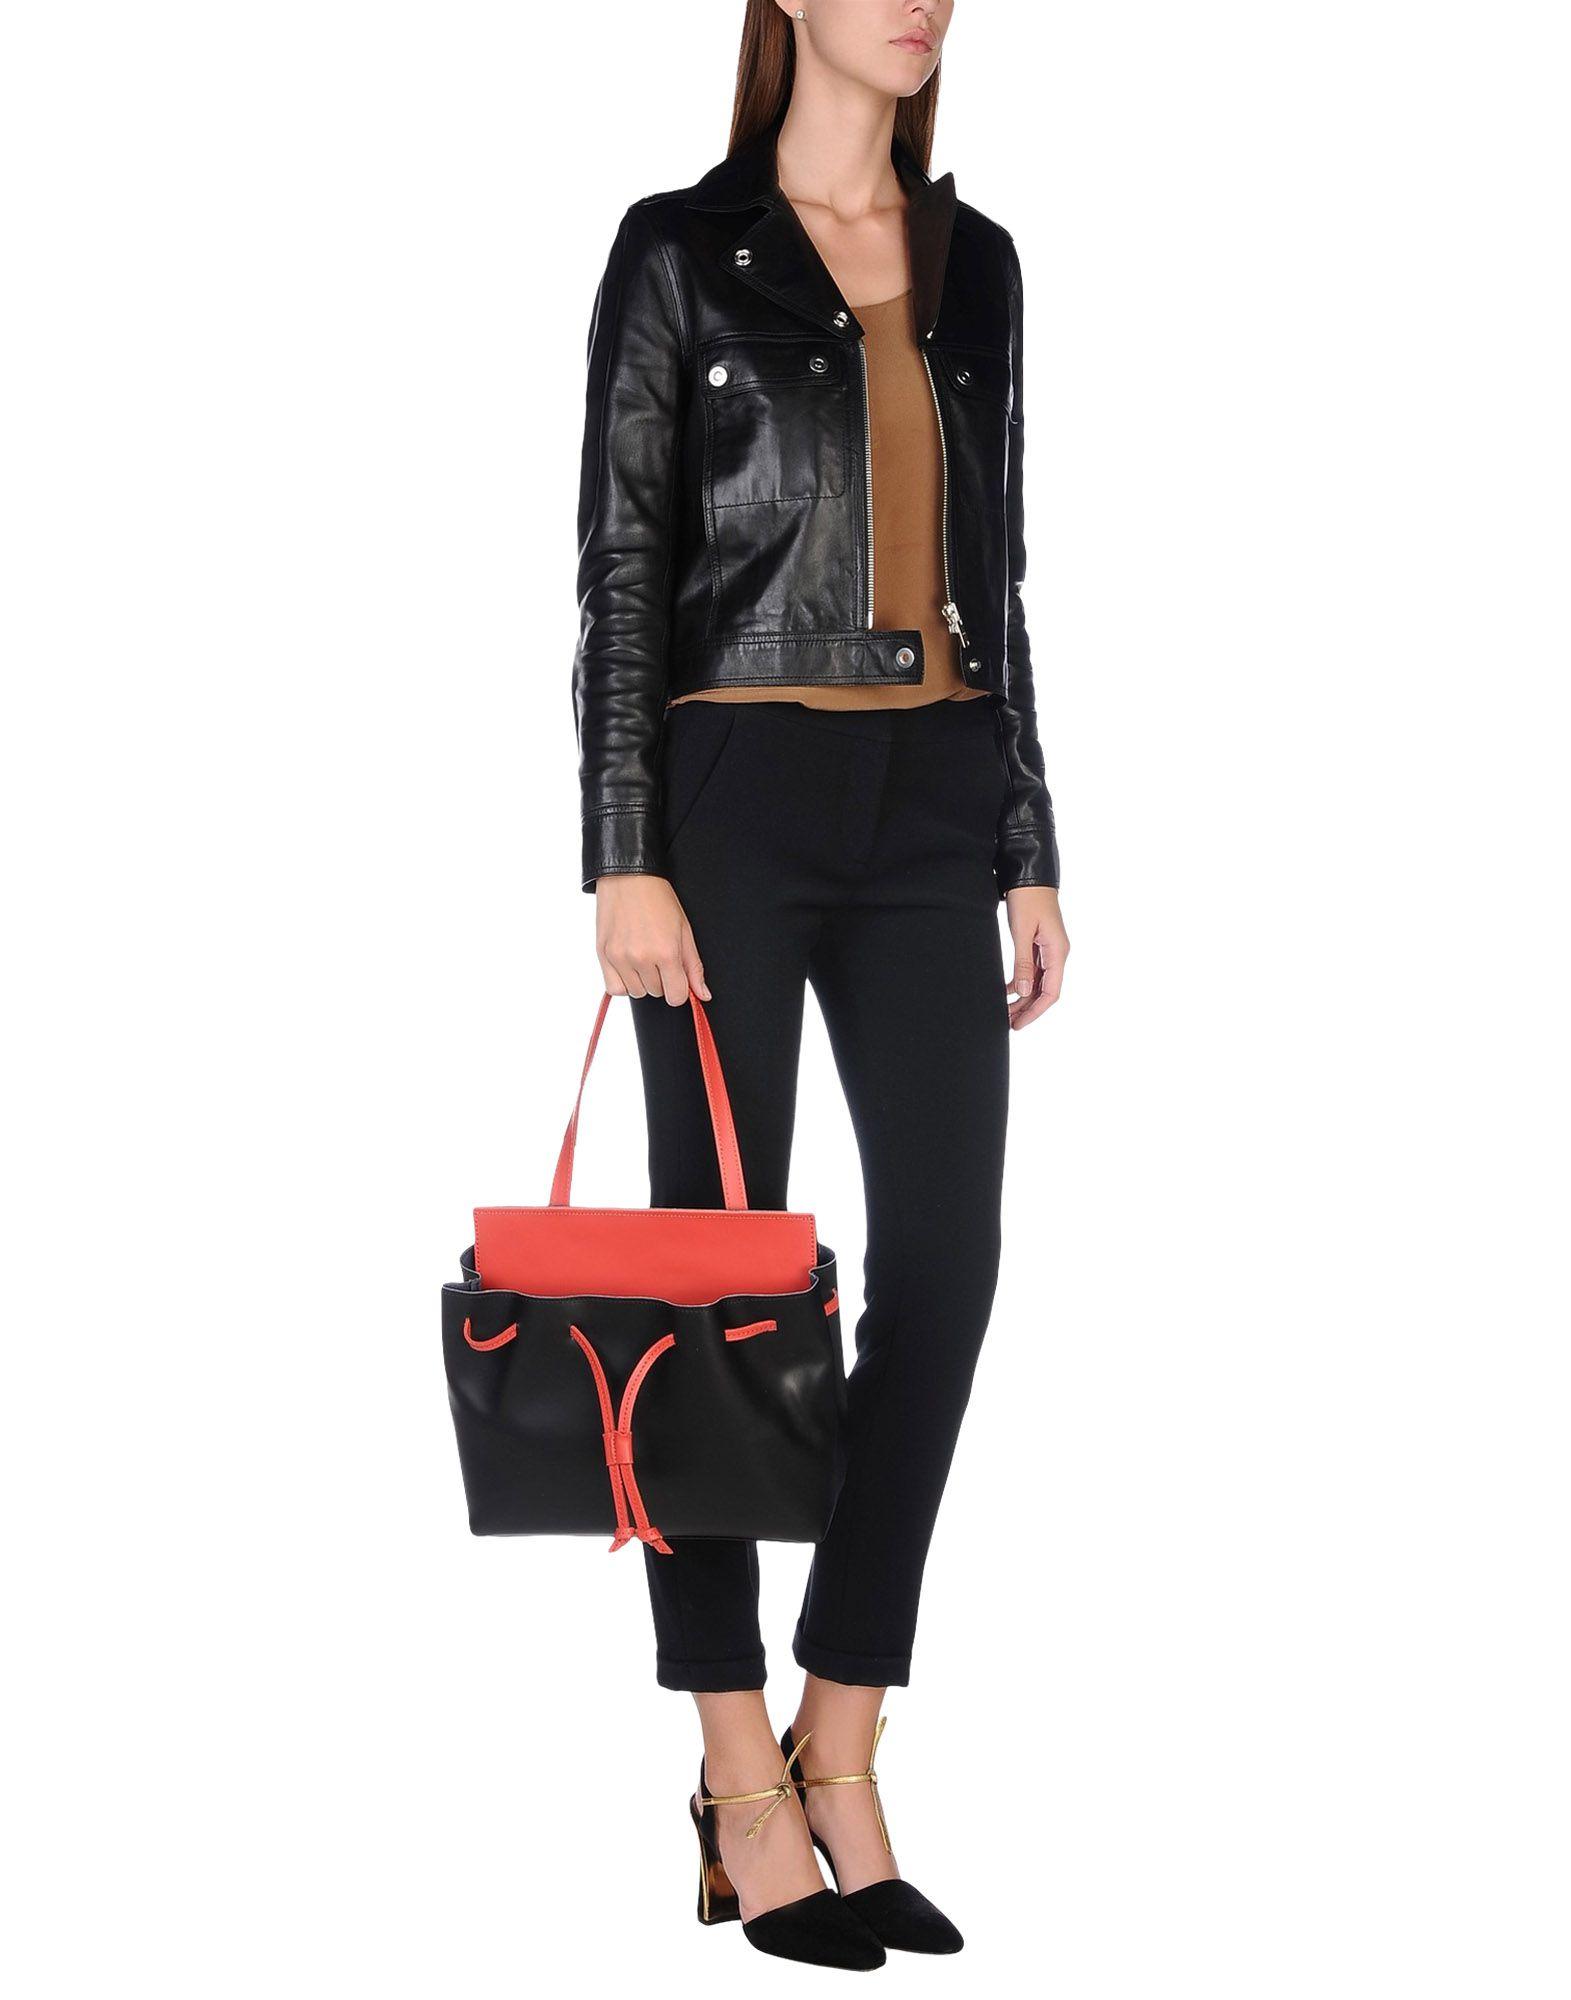 Rue•8 Isquit Handbag   Handbags D by Rue•8 Isquit